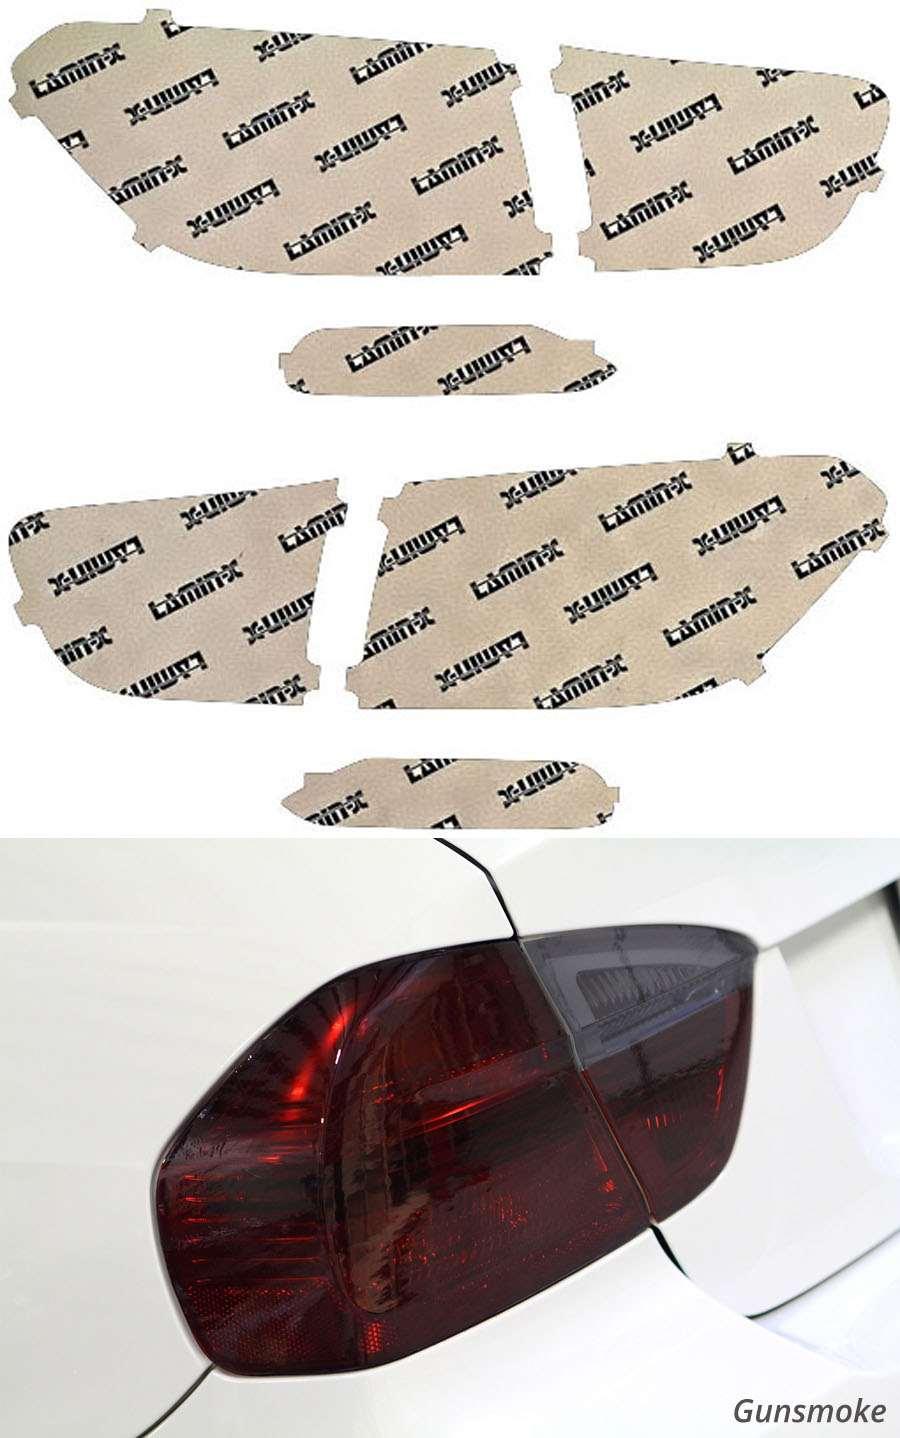 Kia Sorento 16-18 Gunsmoke Tail Light Covers Lamin-X K233G